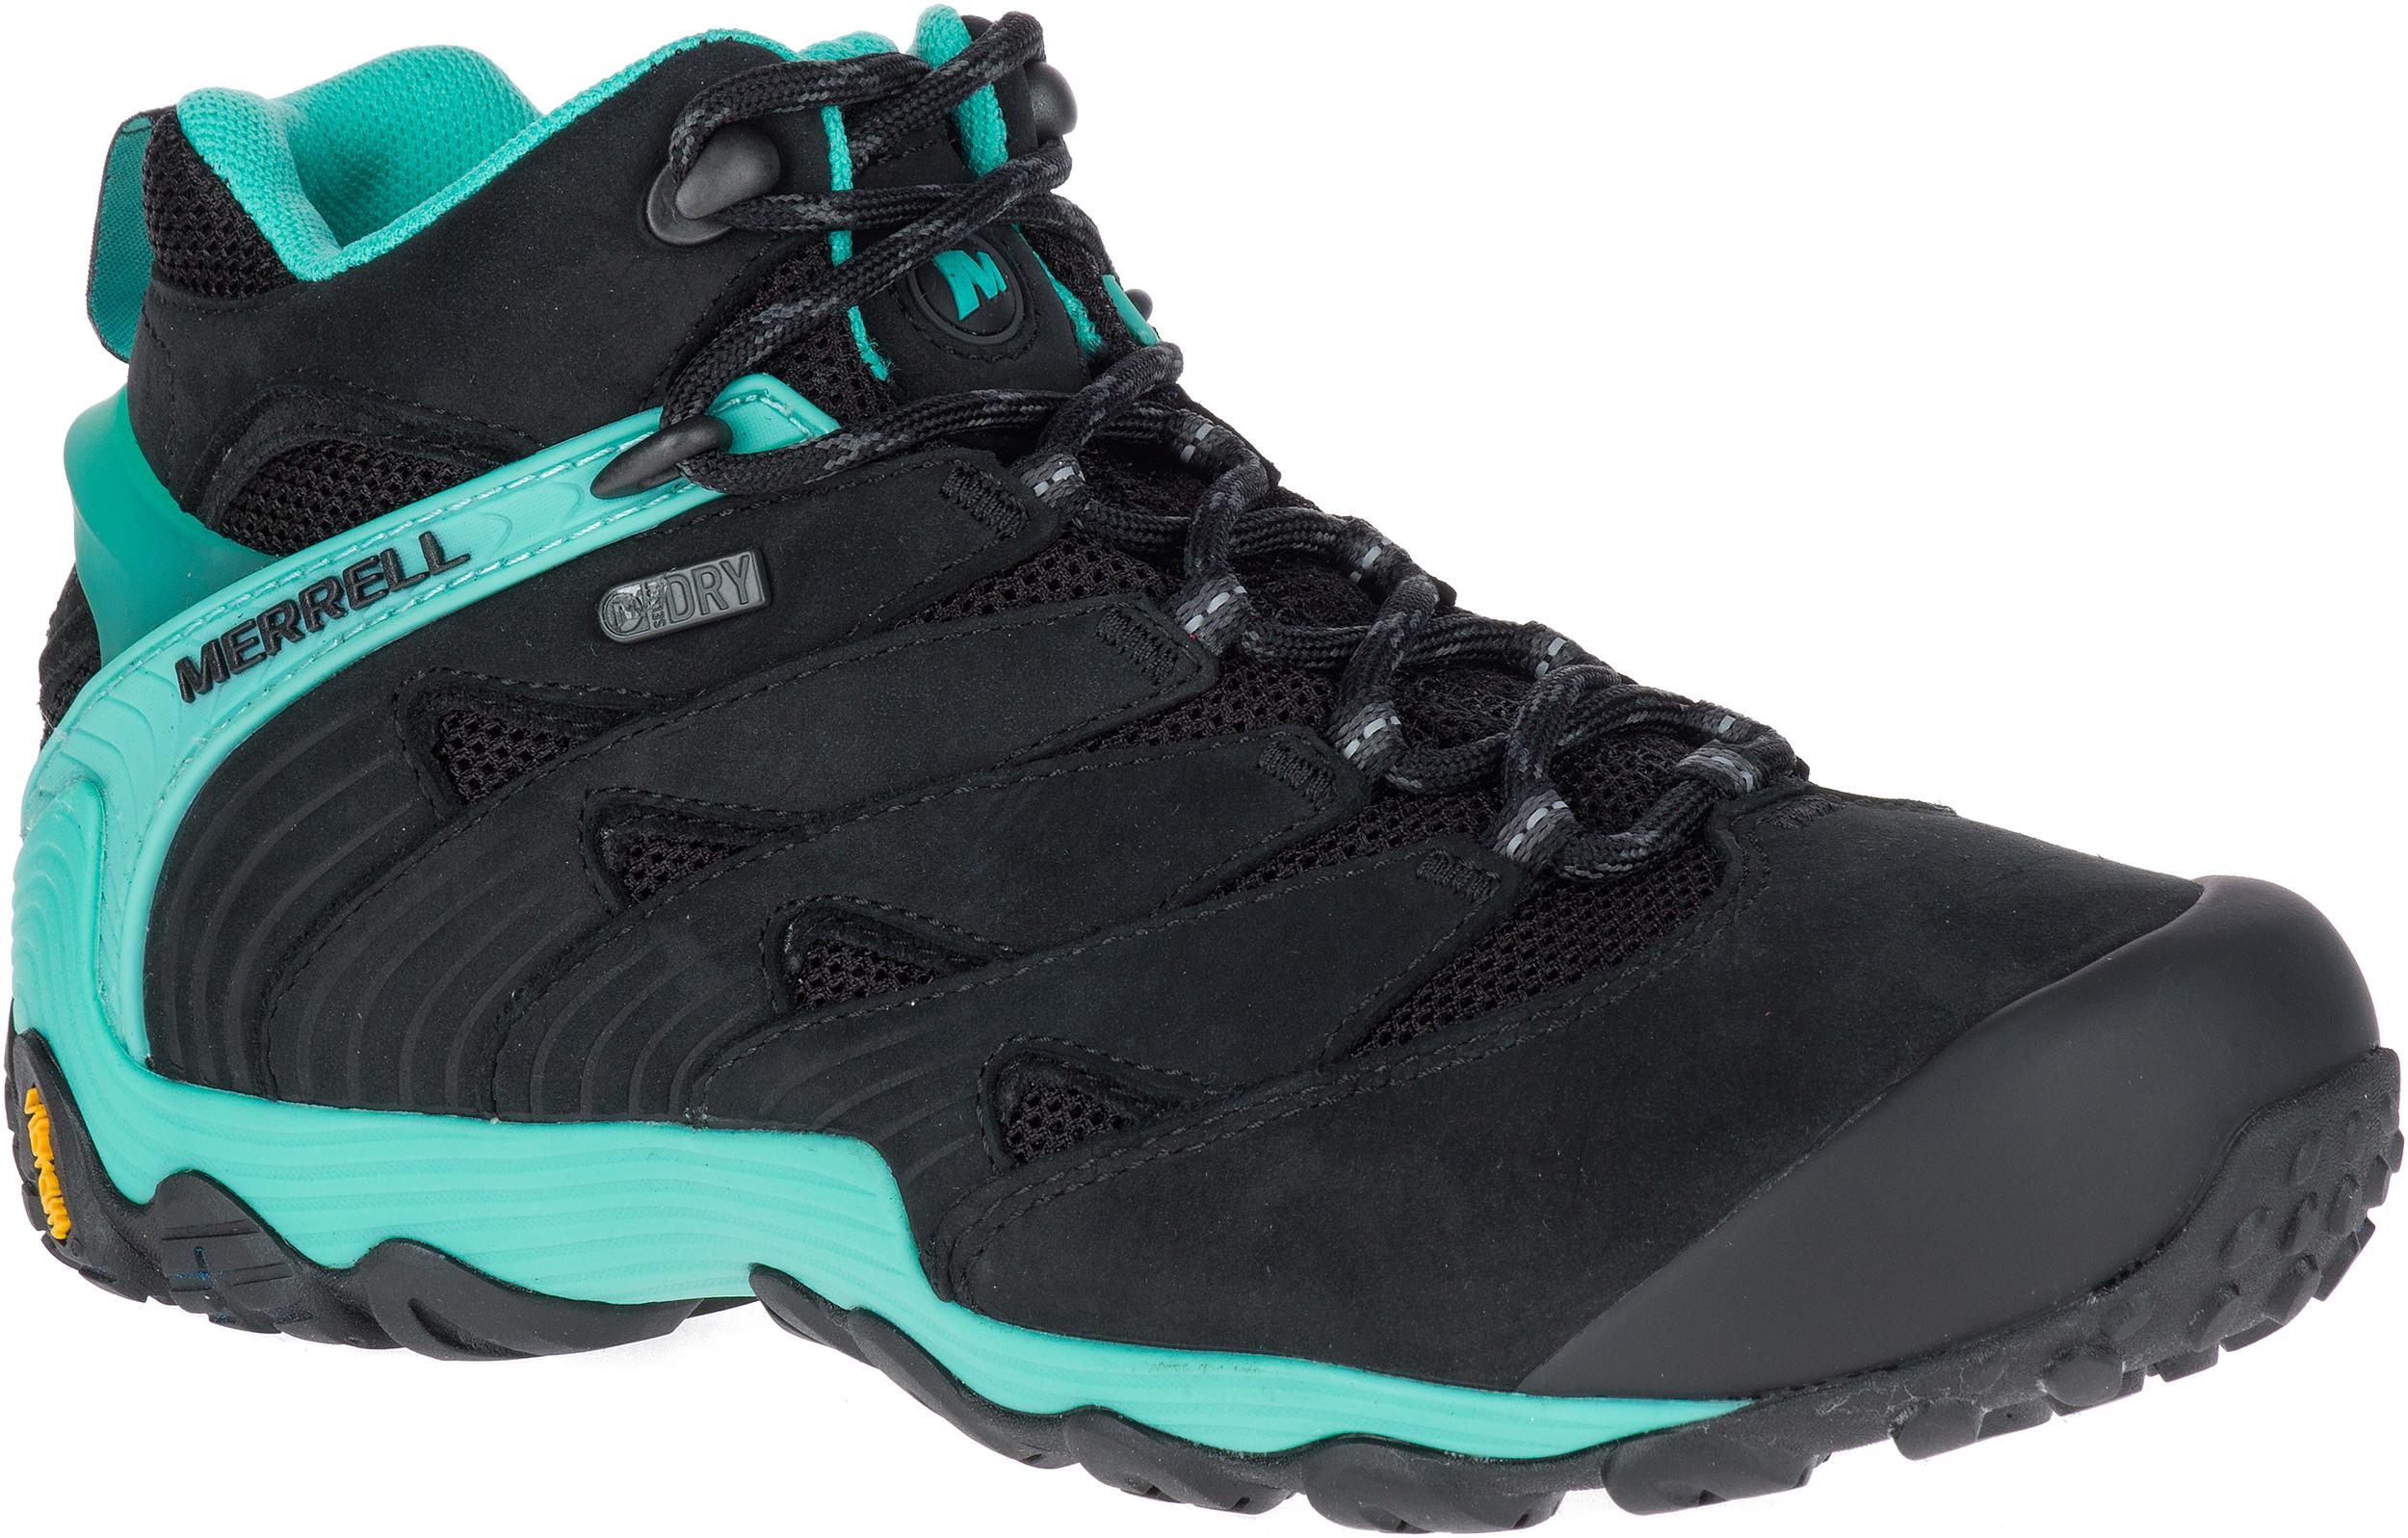 70f7c56e7 Merrell Chameleon 7 Mid Waterproof Hiking Boots - Women's